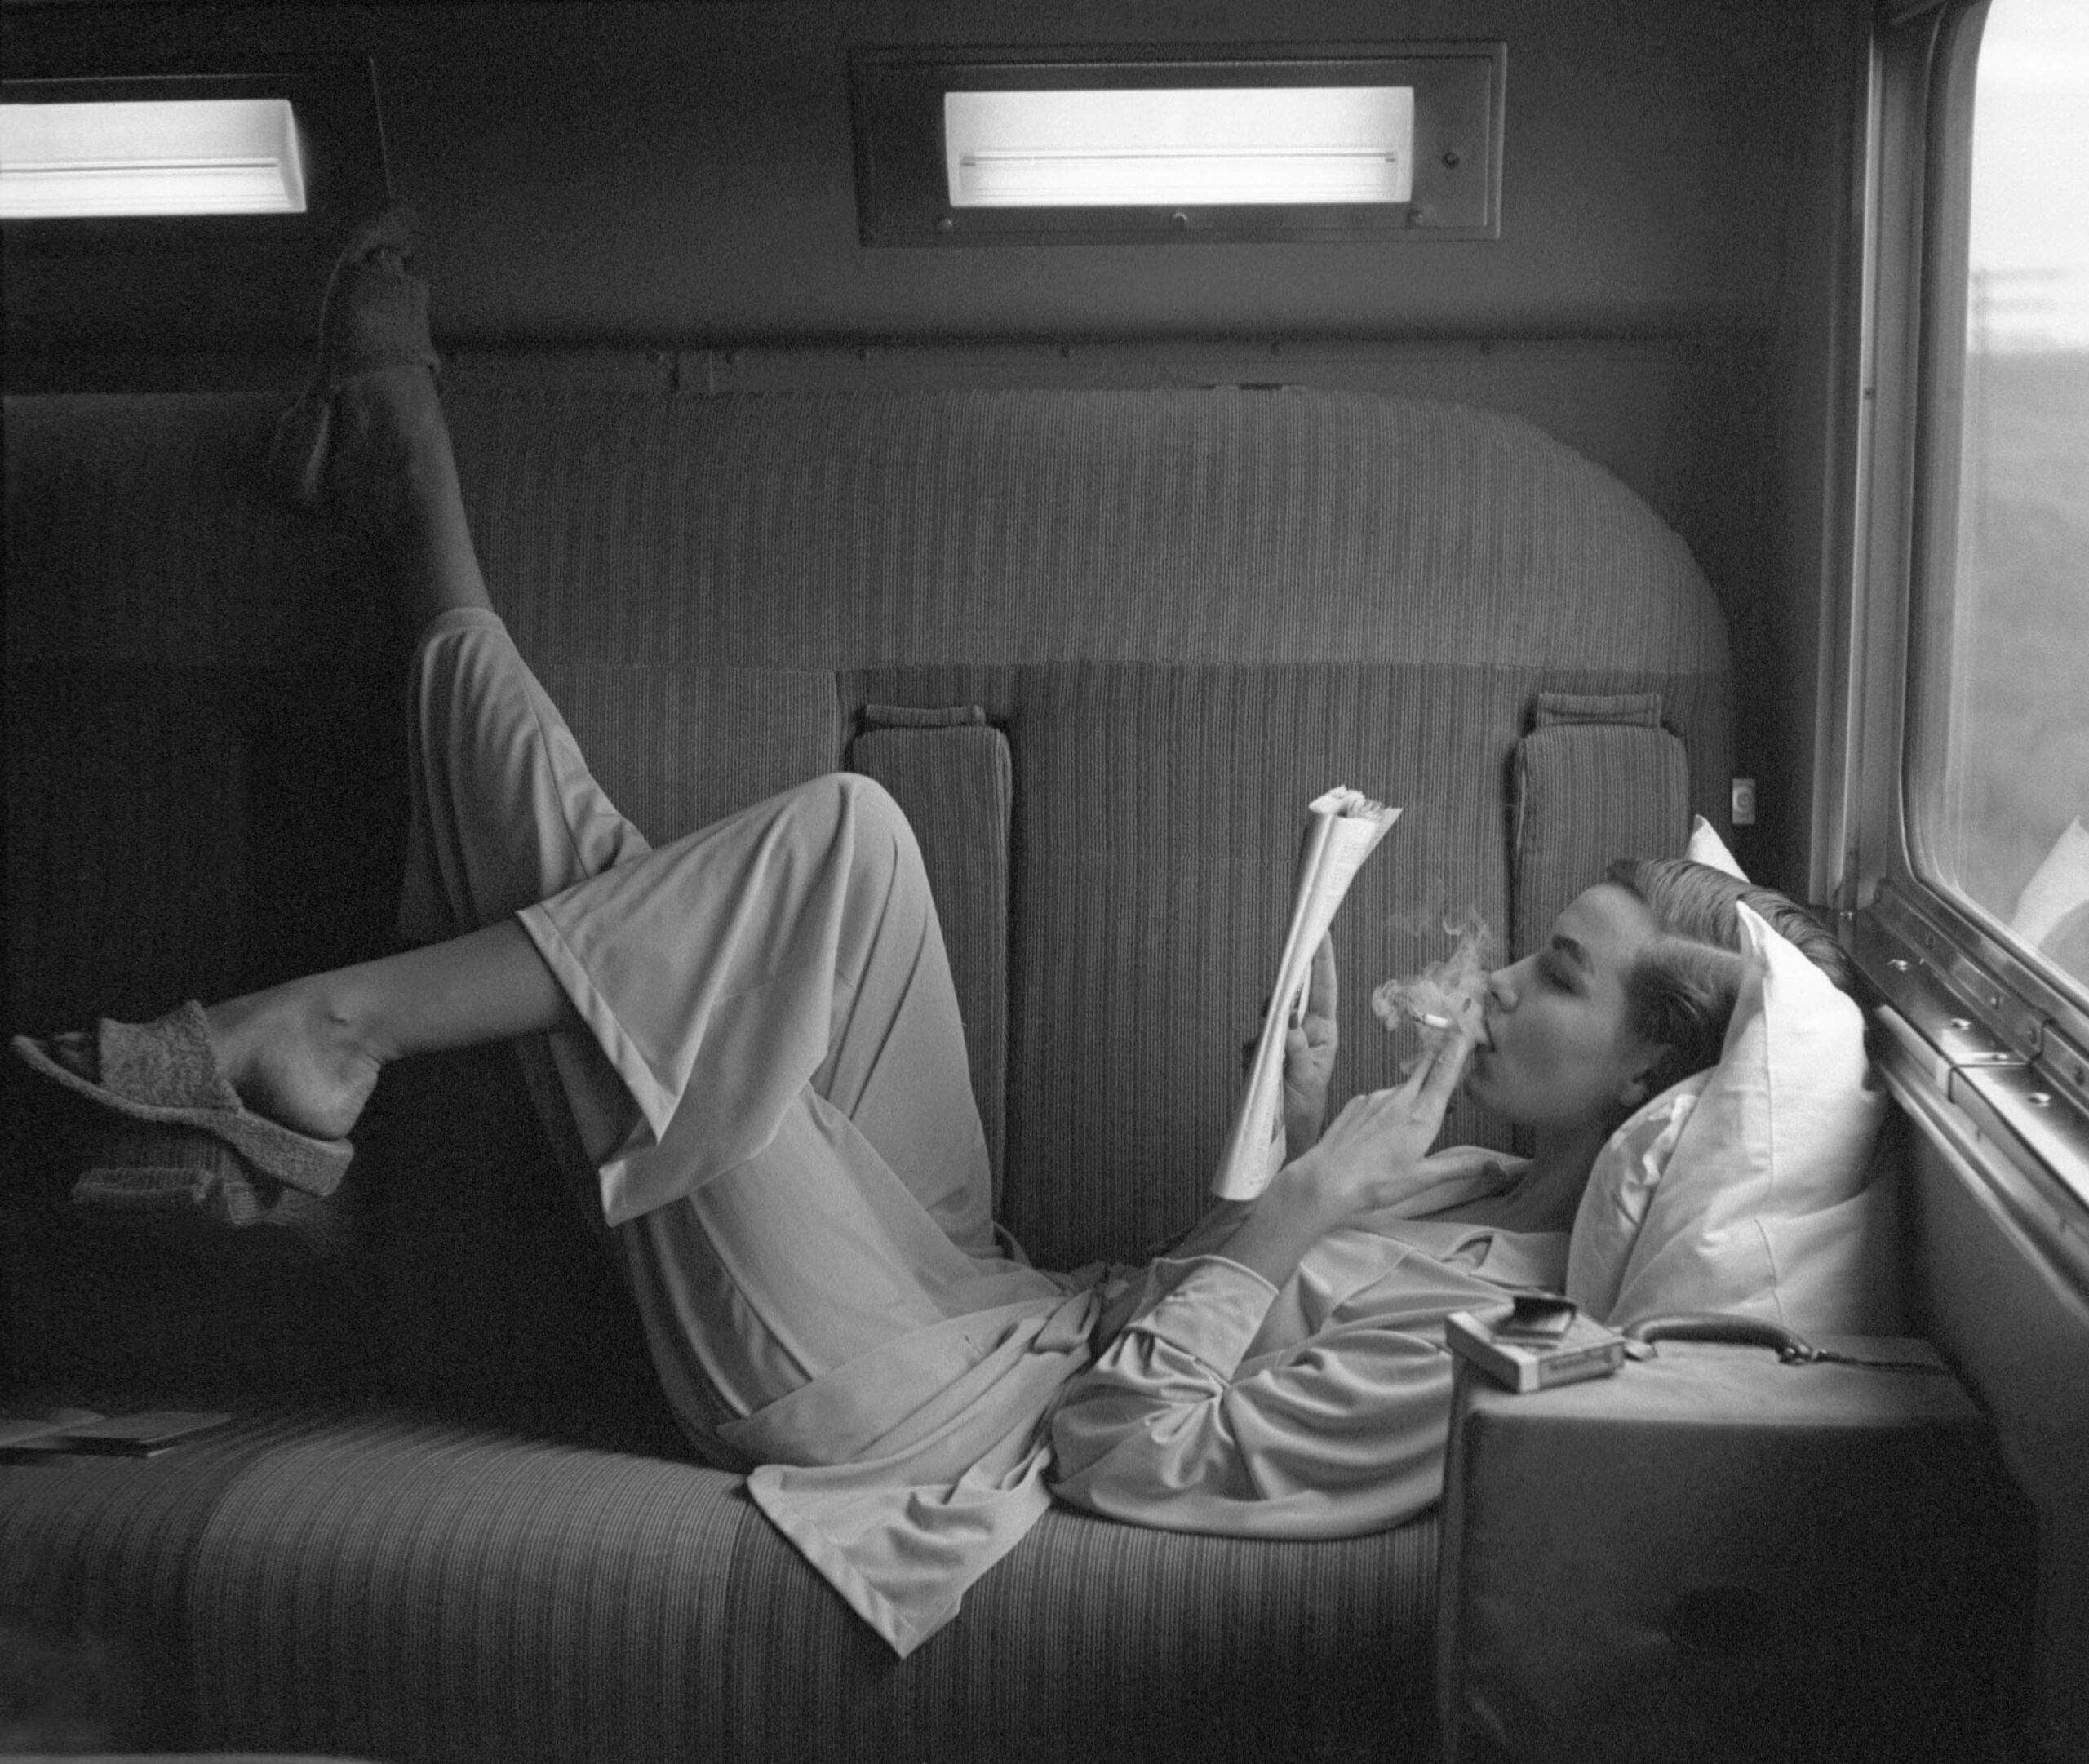 Lillian Bassman's Abstract, Re-Imagined Fashion Photography